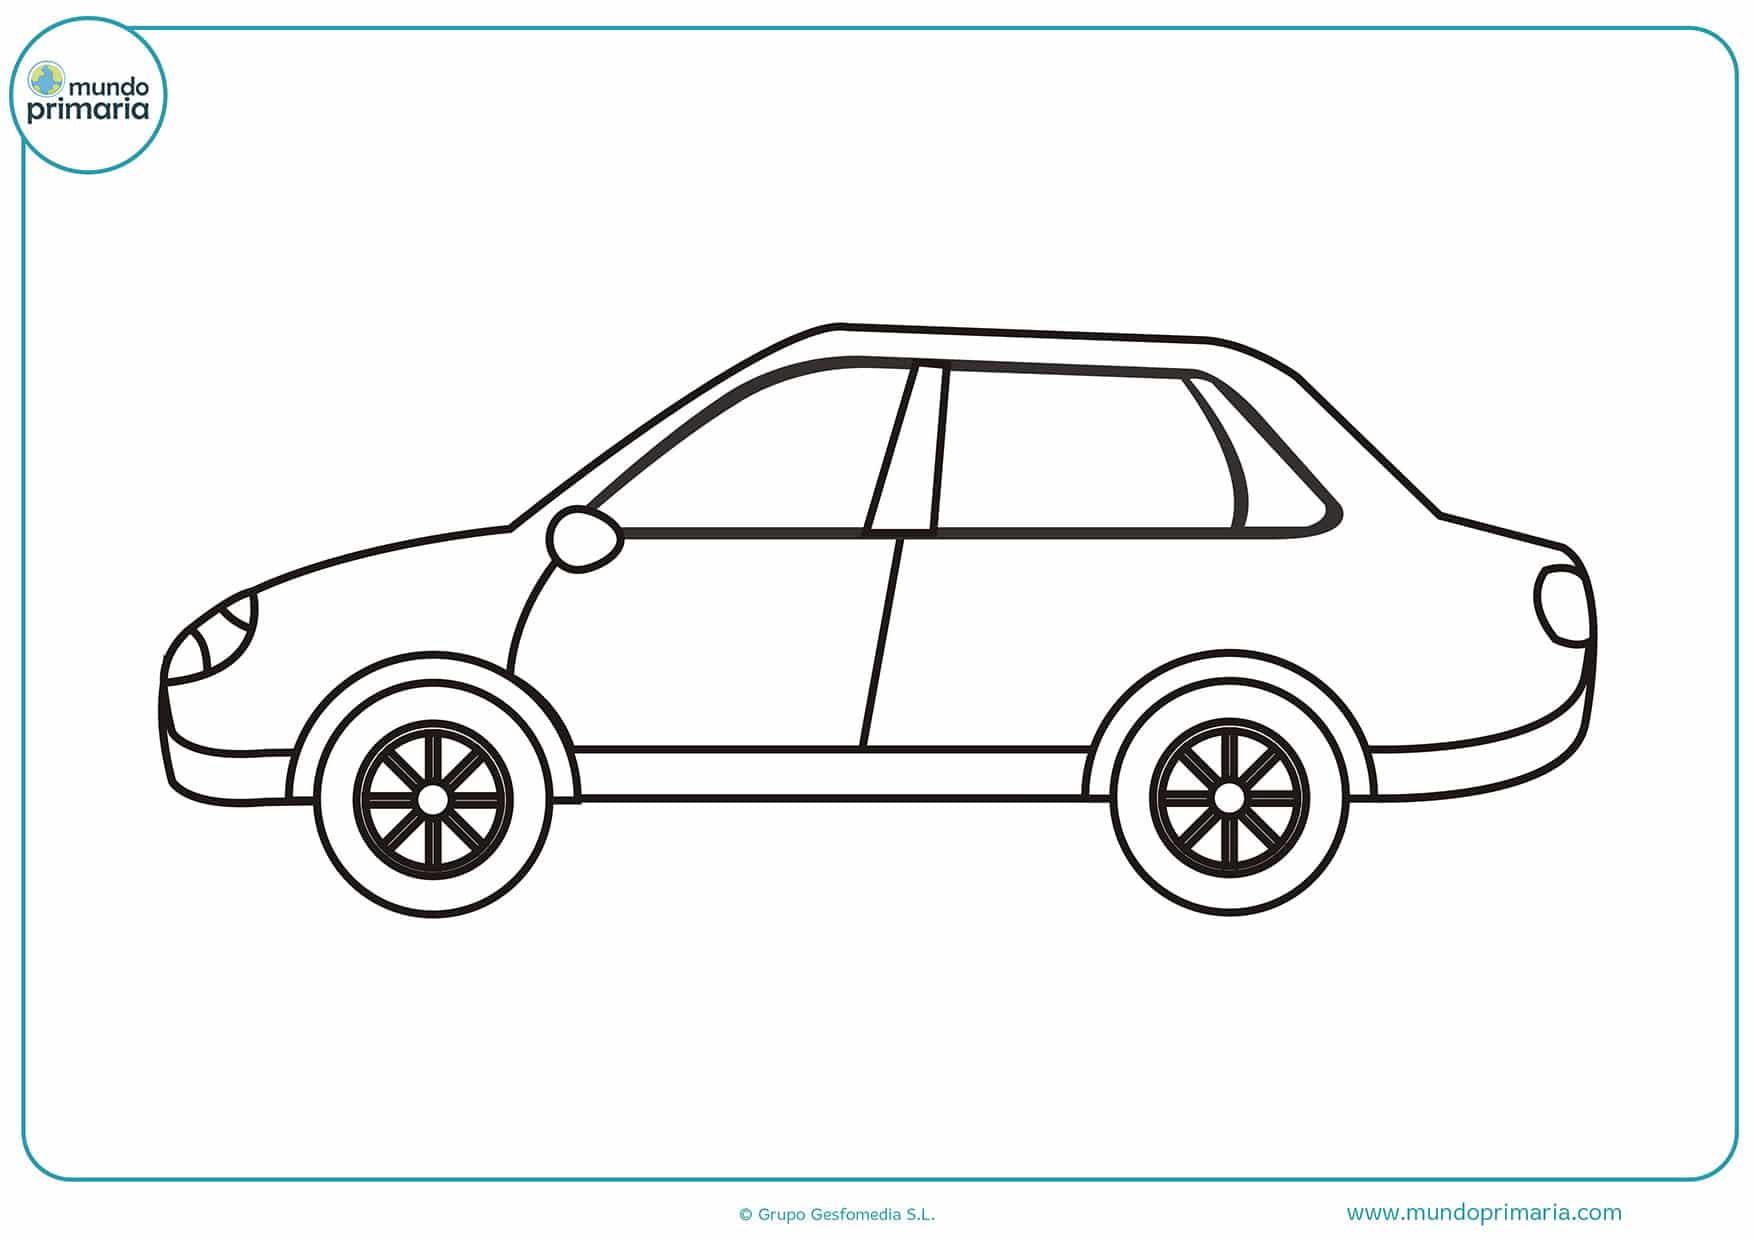 Dibujos coches colorear infantiles